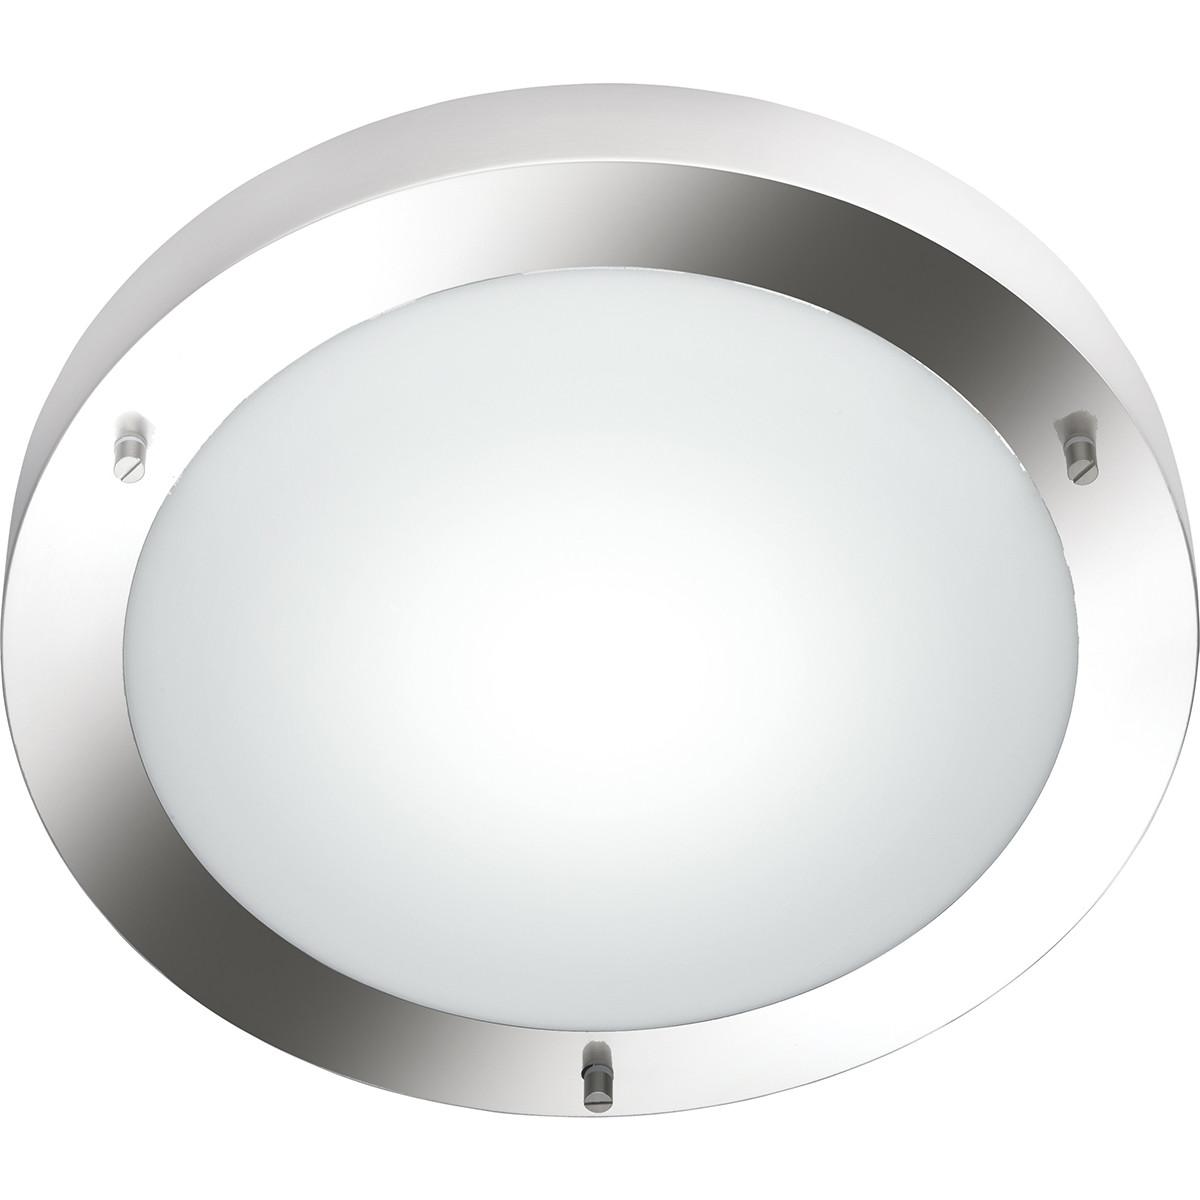 LED Plafondlamp - Trion Condi - Opbouw Rond - Spatwaterdicht IP44 - E27 Fitting - Mat Nikkel Alumini